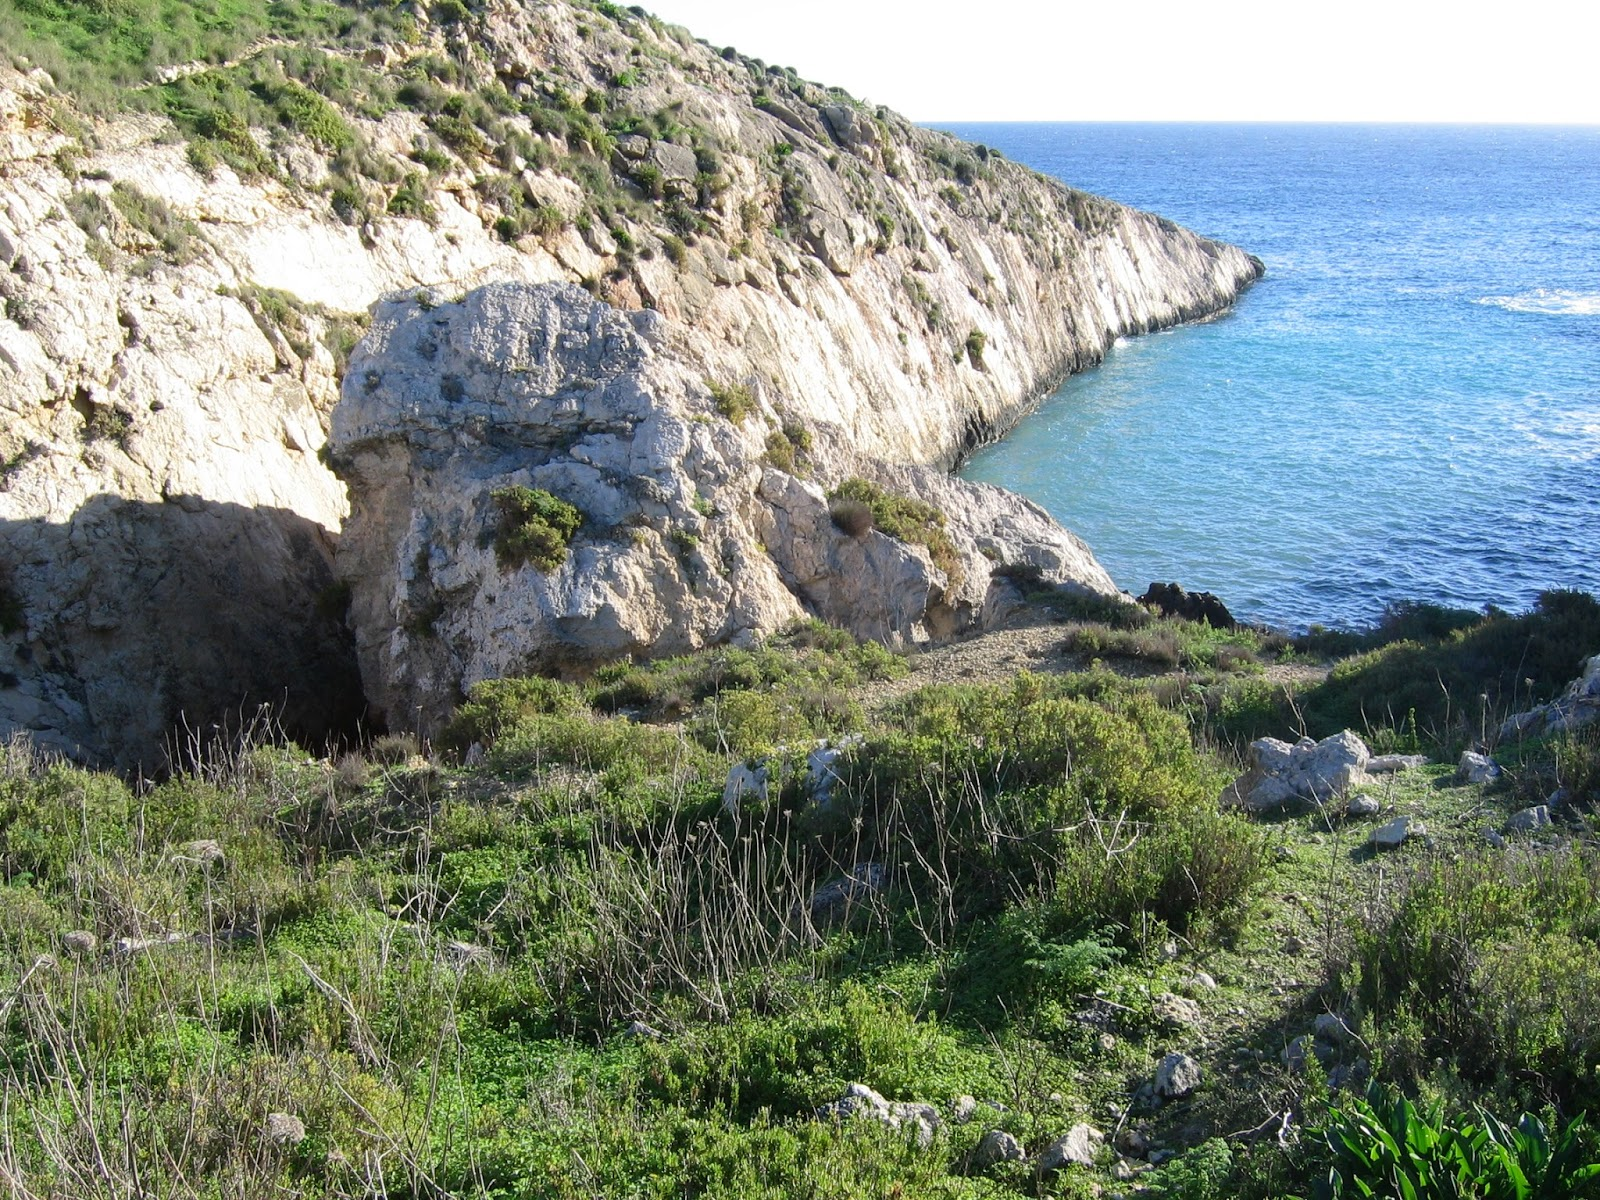 Nature Images 2mb: Malta And Gozo Natural Scenery: Qala Gozo